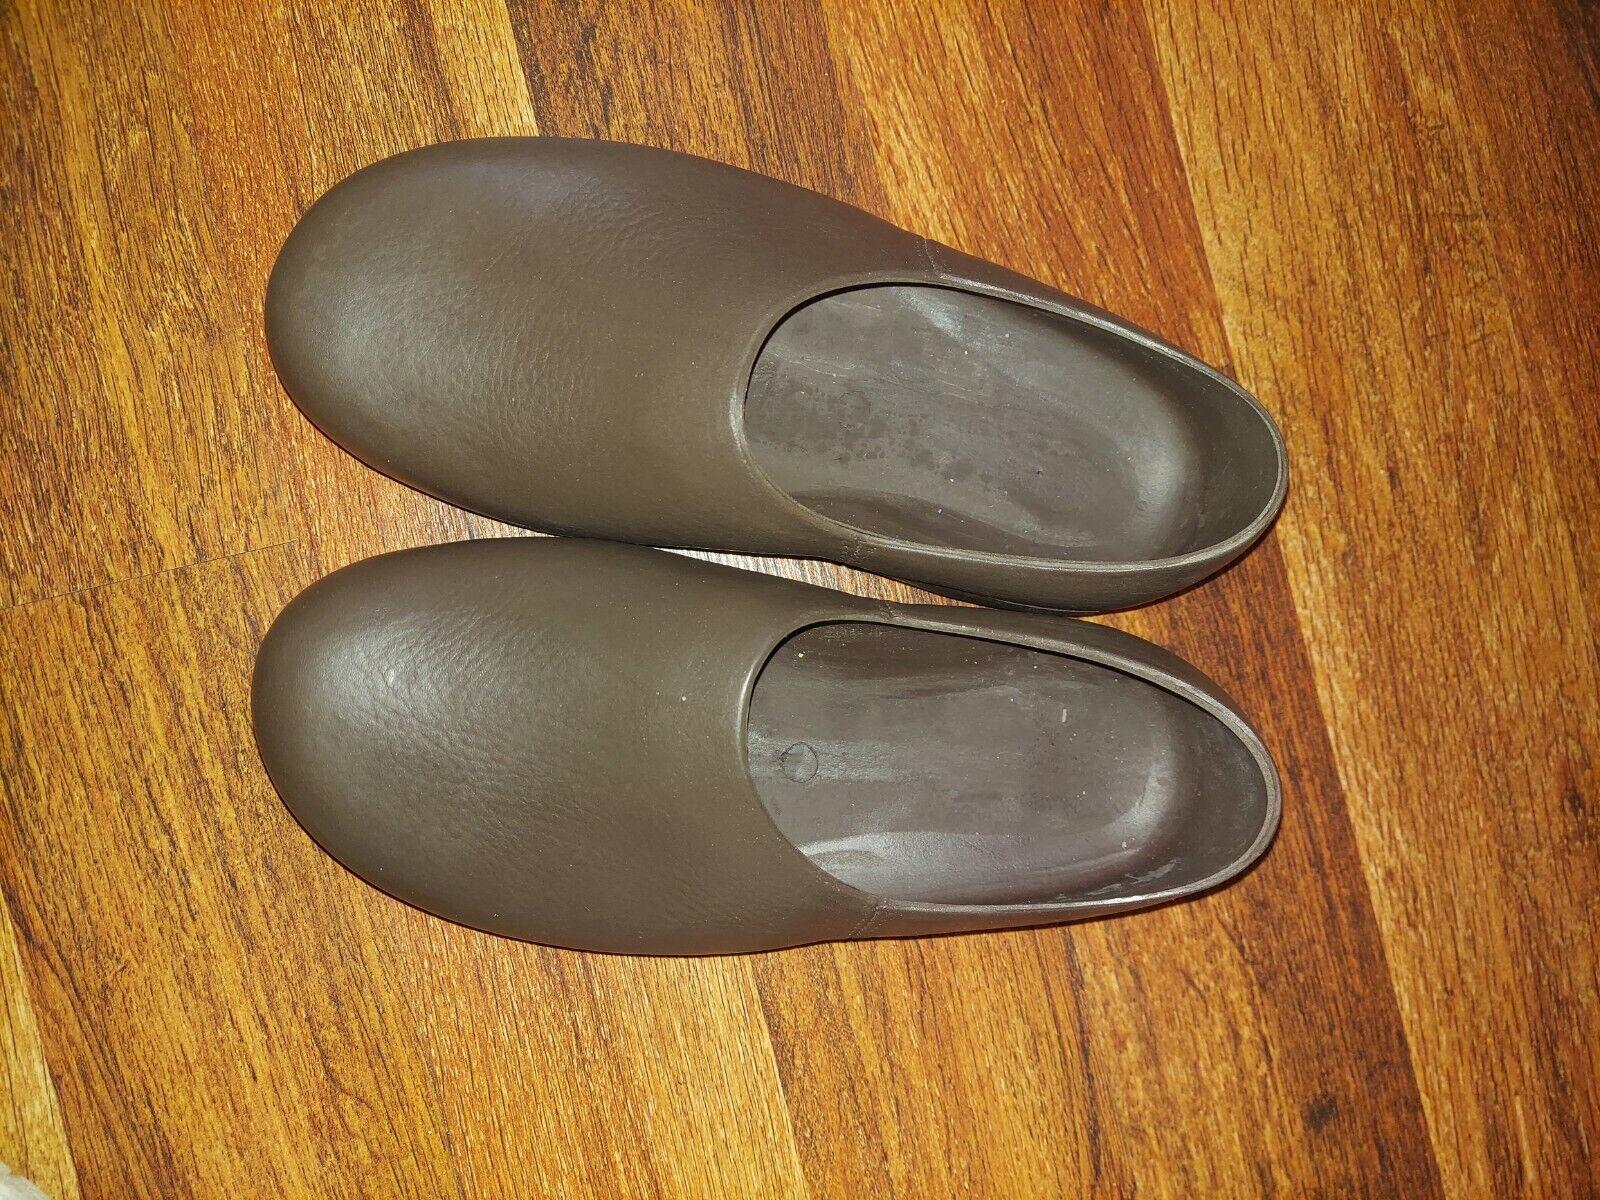 ANA TECH Womens size 39 Walk The Walk Pro Body Brown Polyurethane Shoes Clogs